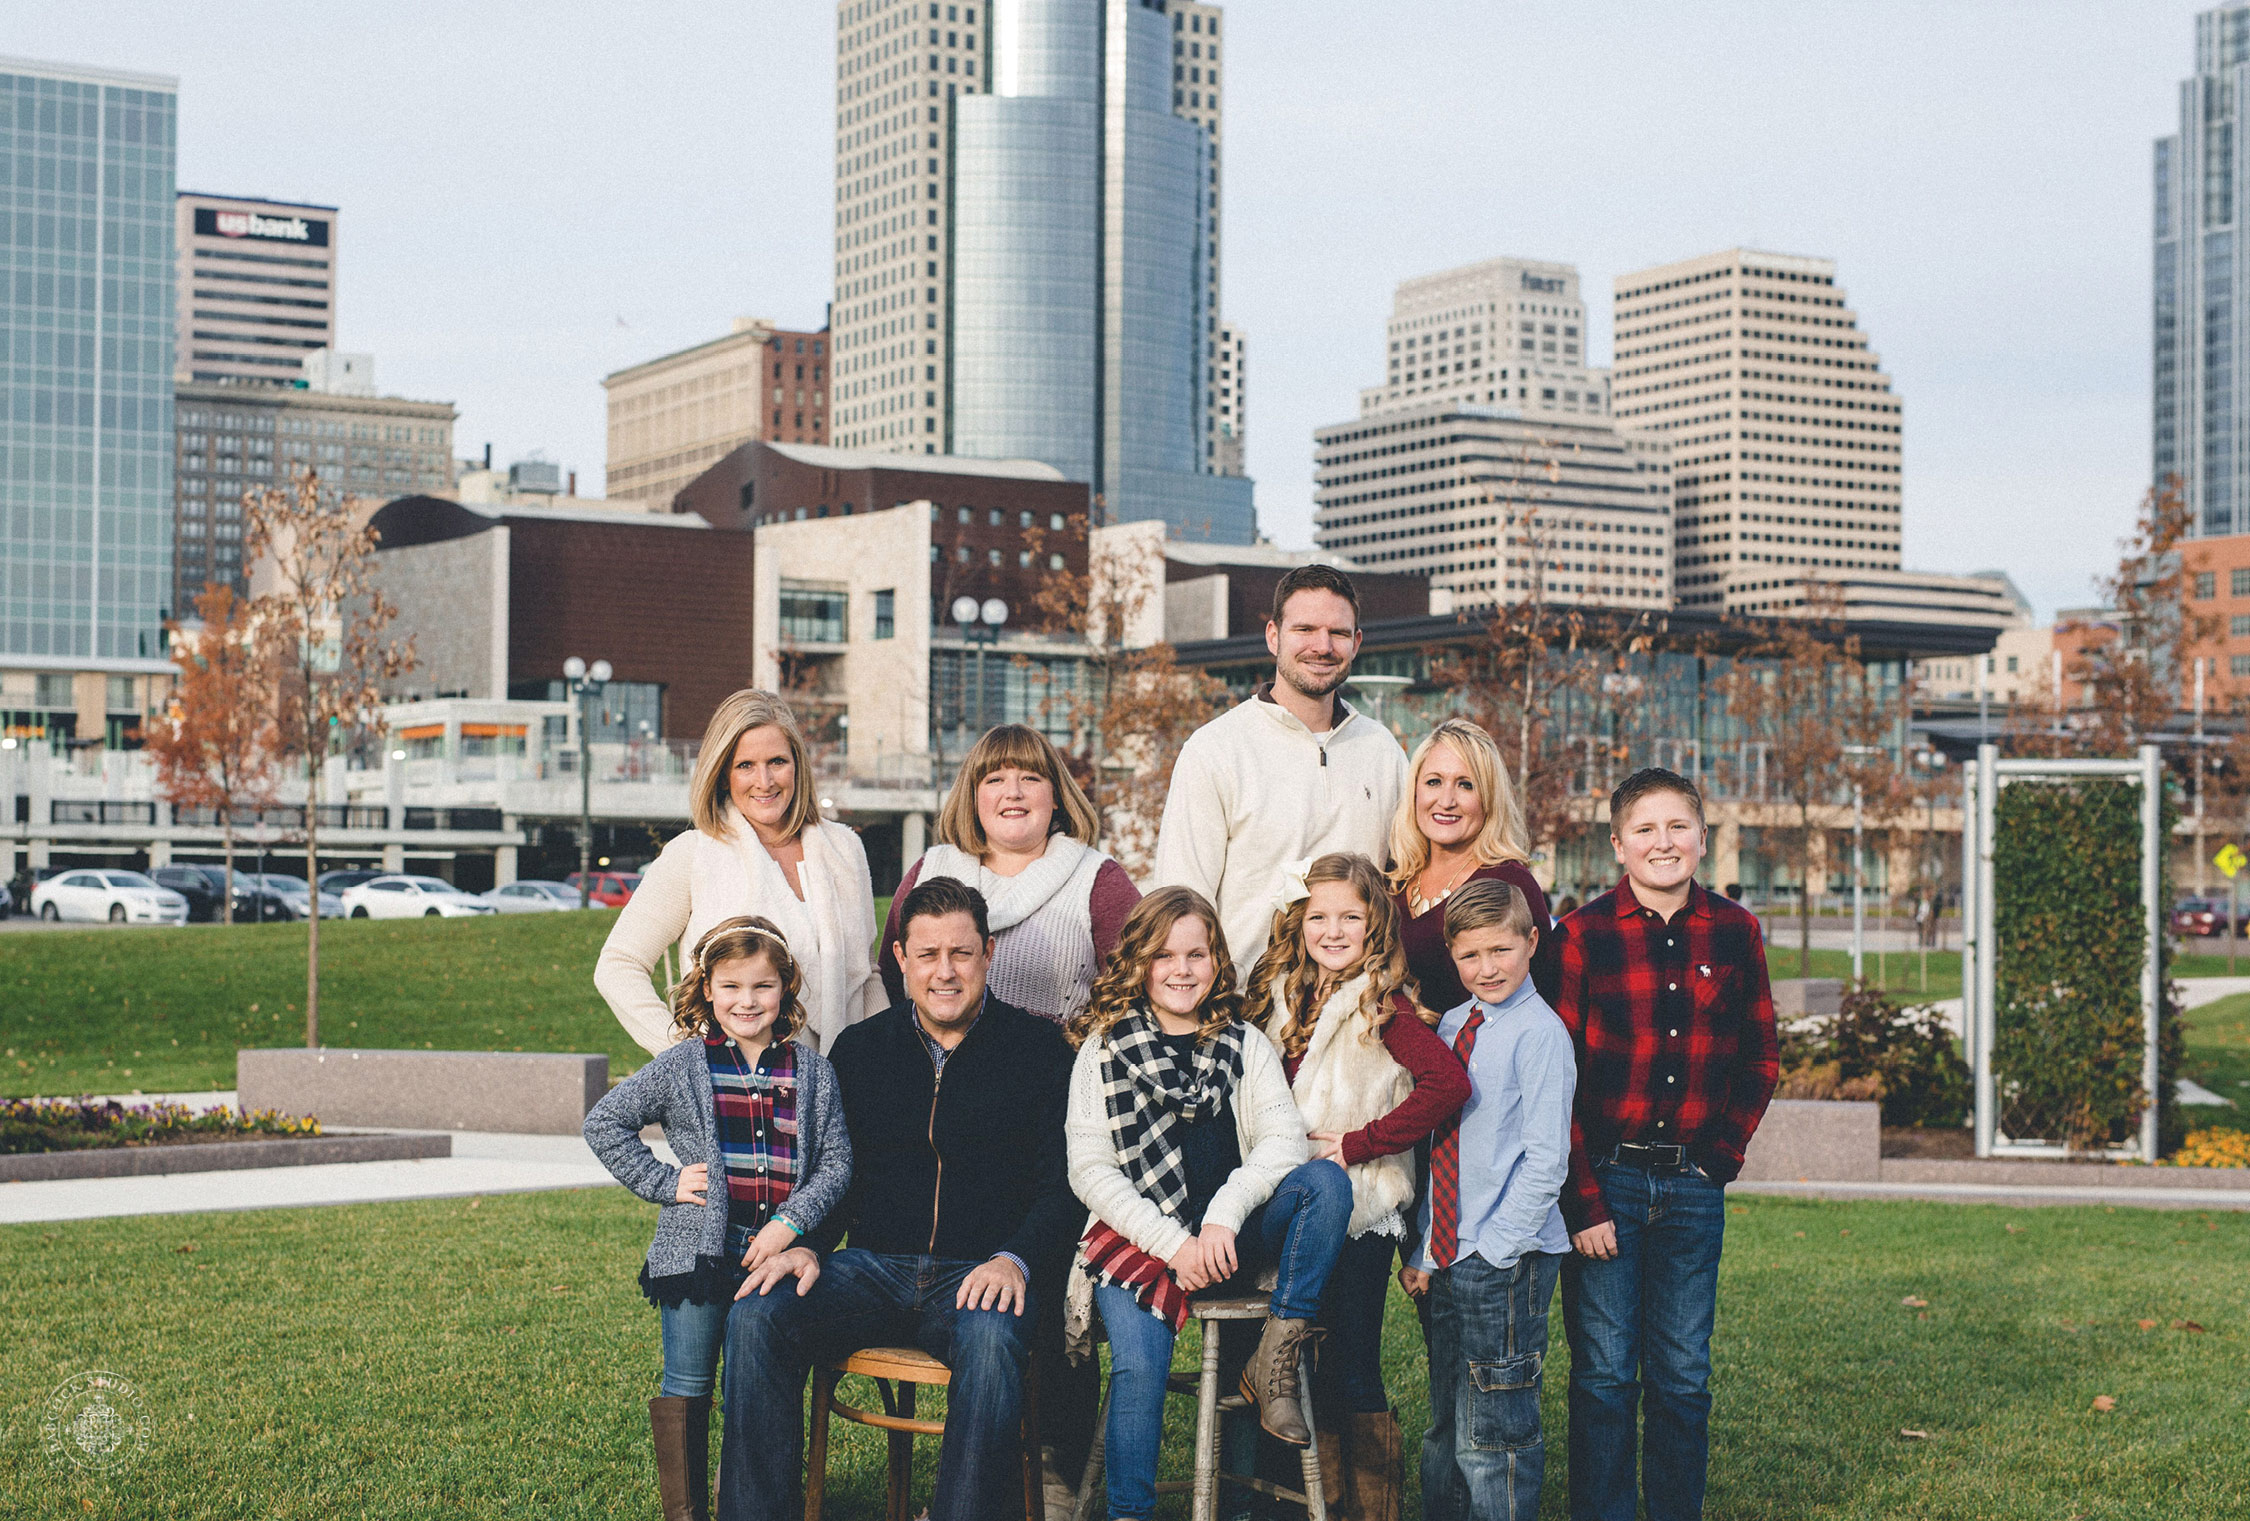 matichel-family-photographer-cincinnati-ohio-2.jpg